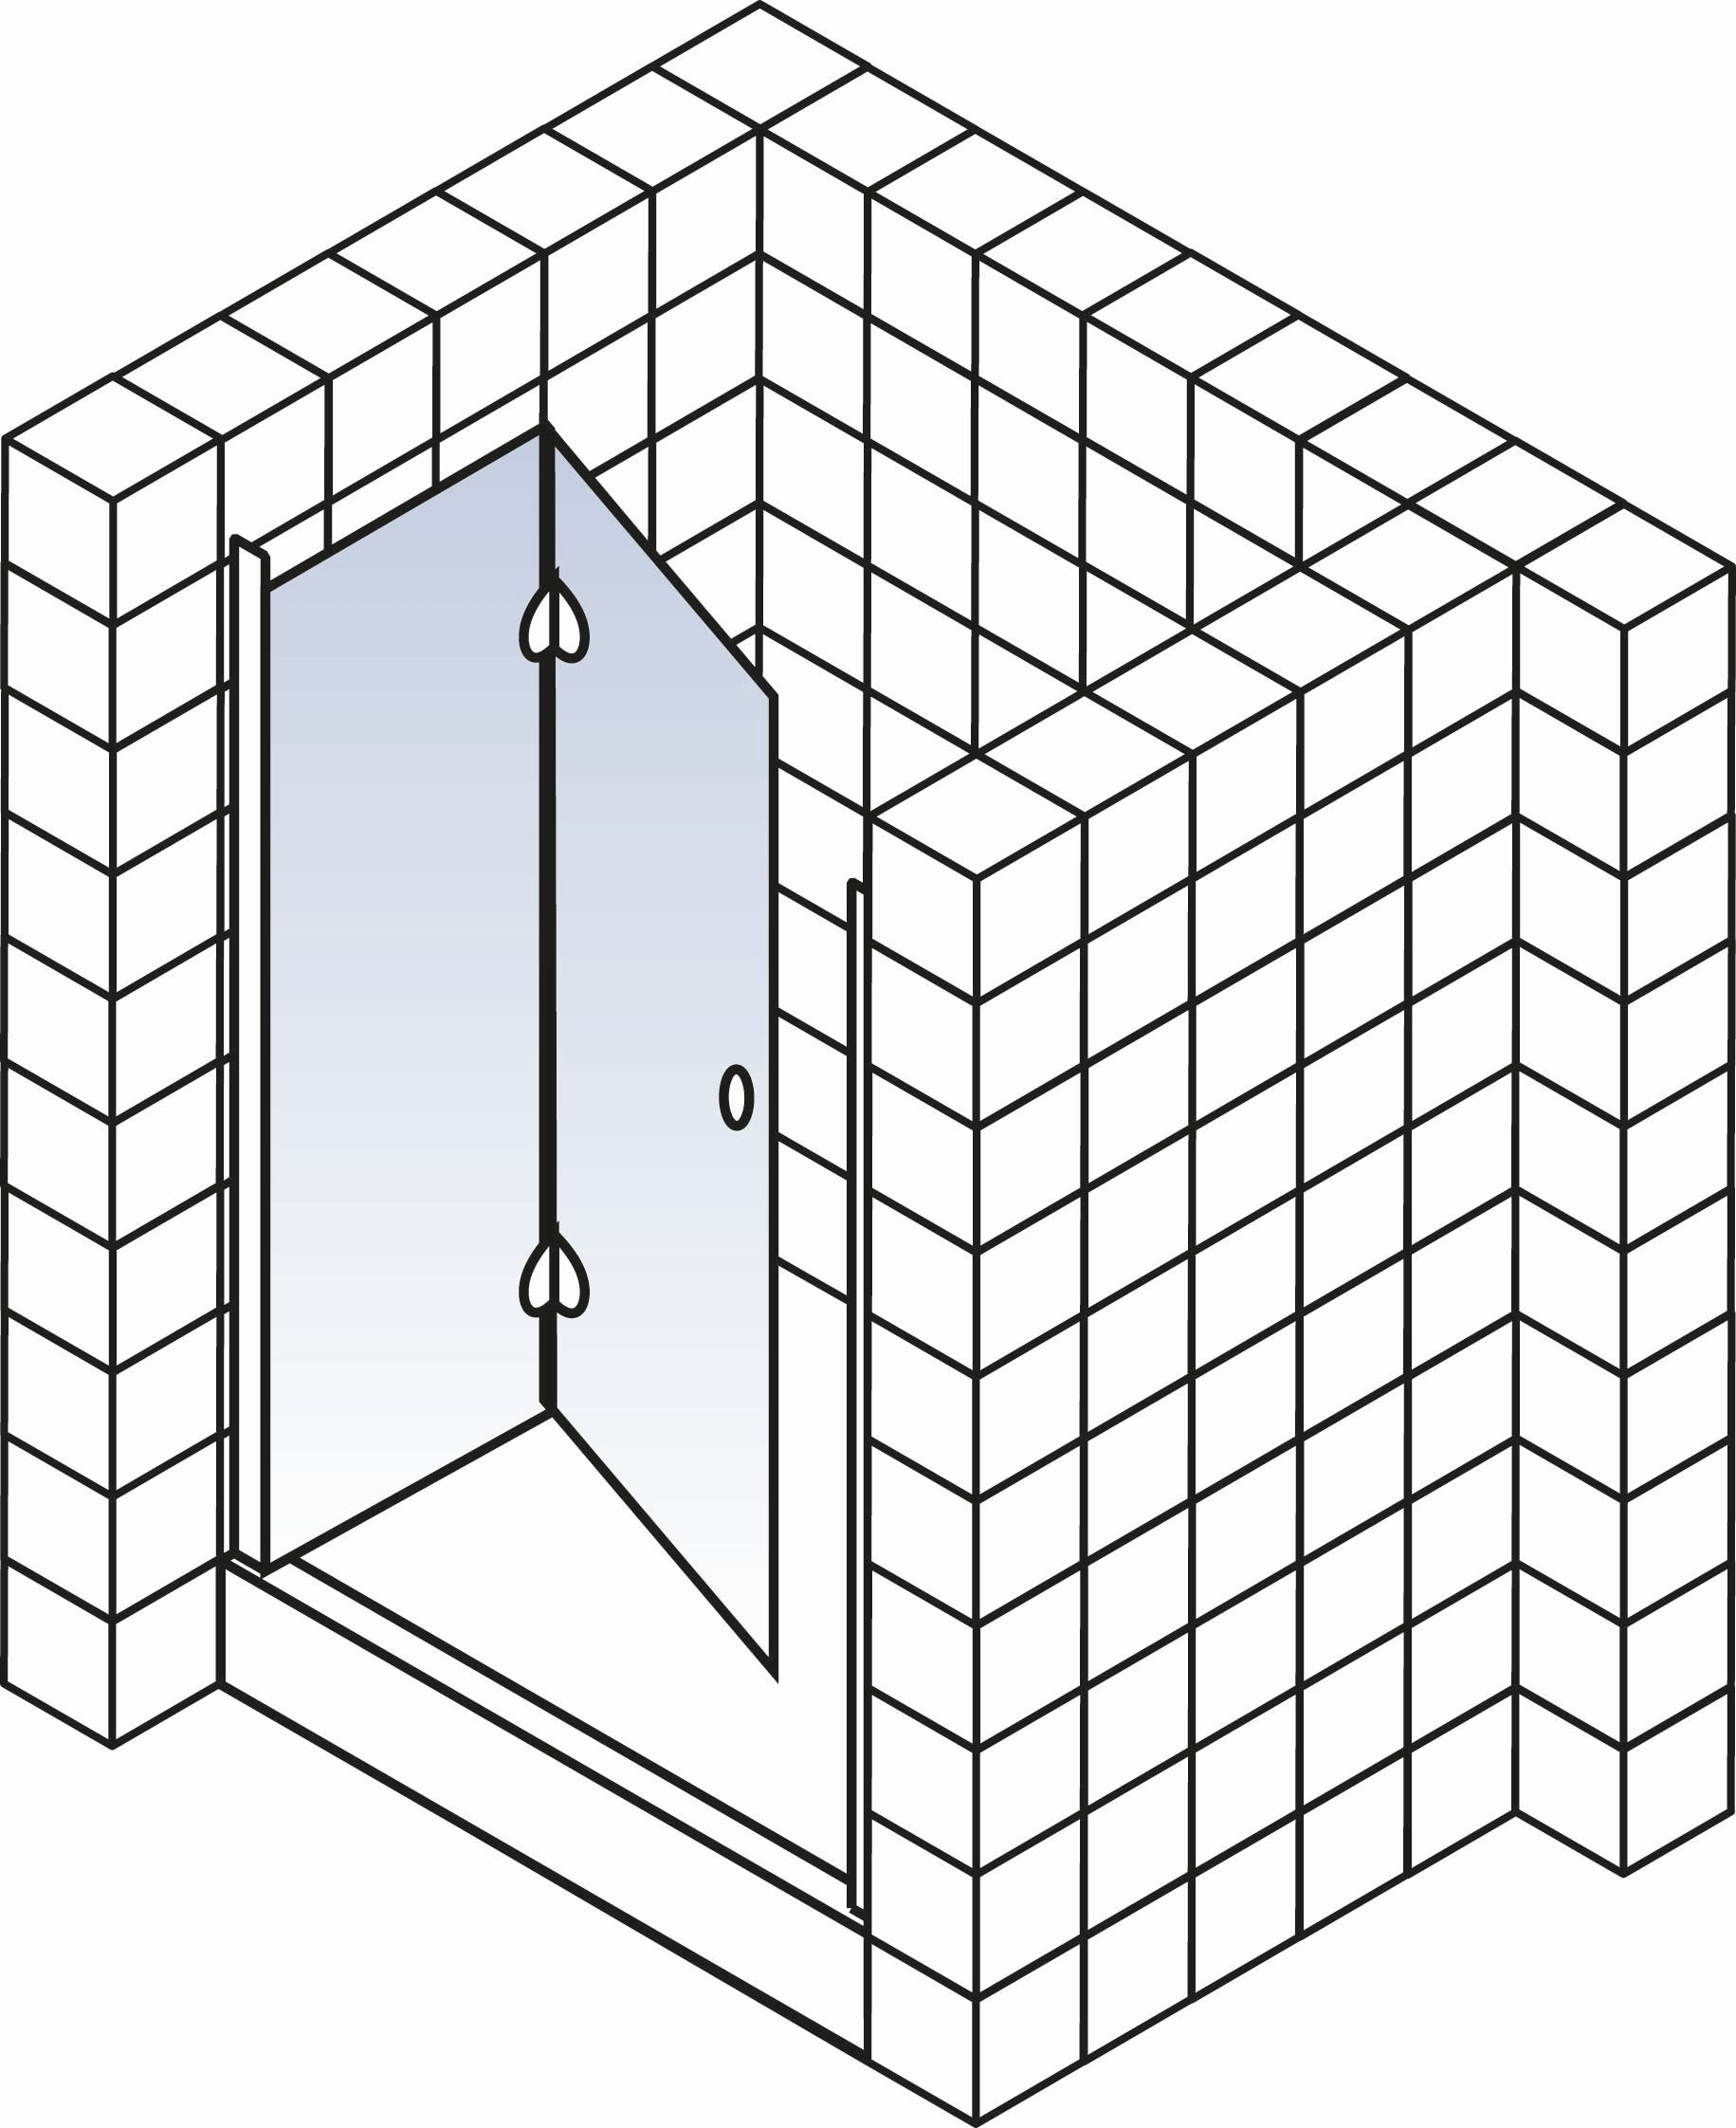 schulte garant drehfaltt r 2 teilig f r nische echtglas sonderma d870199. Black Bedroom Furniture Sets. Home Design Ideas